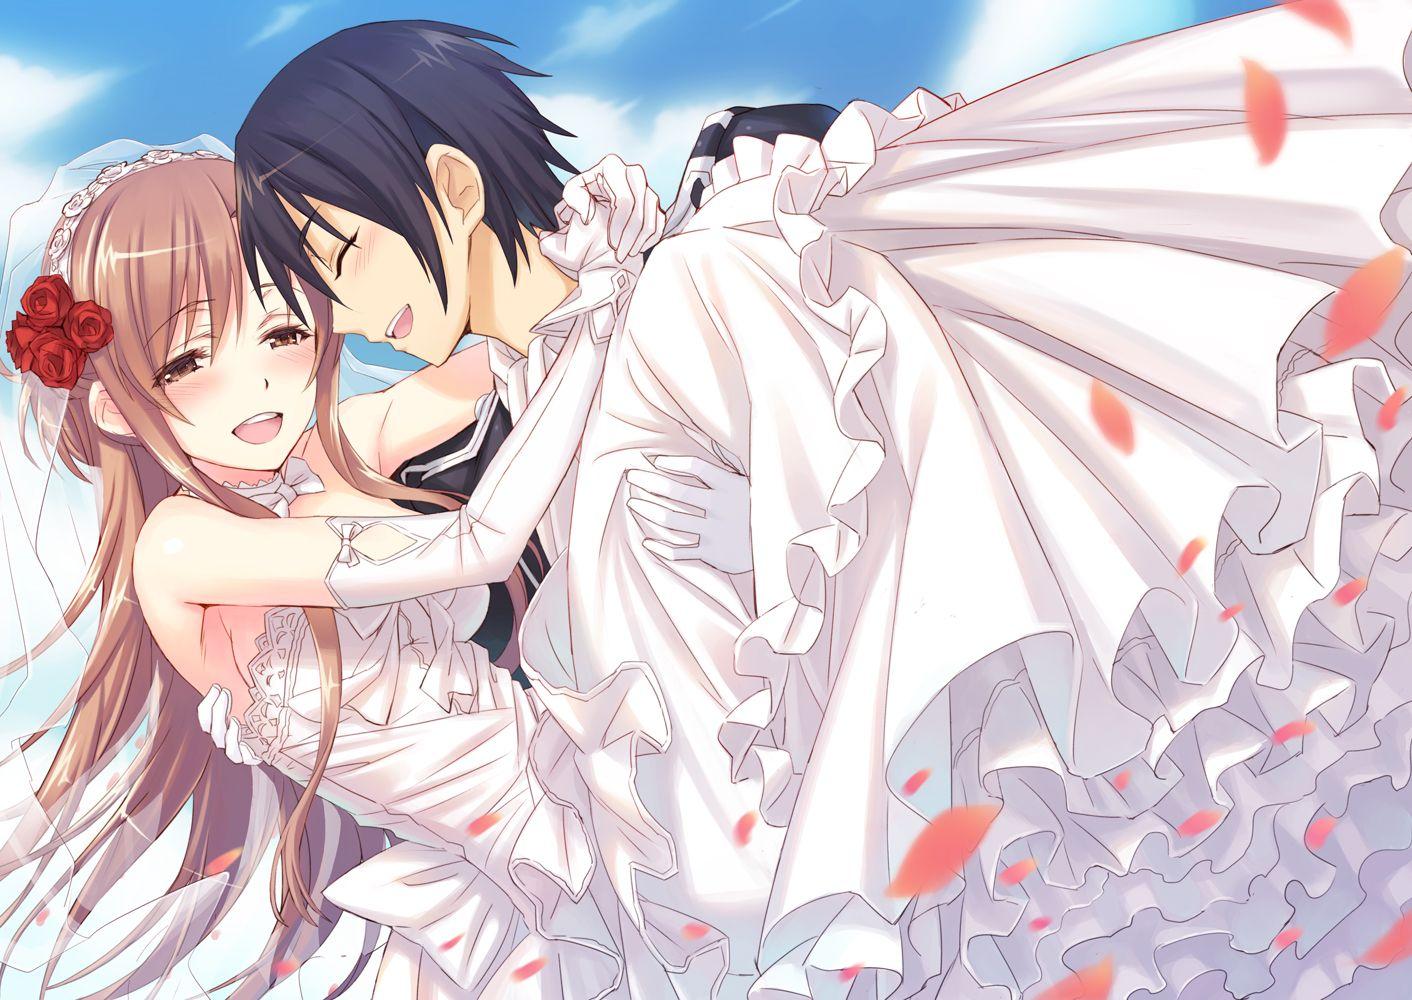 Sword Art Online Kirito And Asuna Wedding Fanfiction Wiring Diagrams F350 Diagram Http Wwwjustanswercom Ford 50adb2008f350 Fanfic X Sso Prologue Anime Rh Pinterest Com